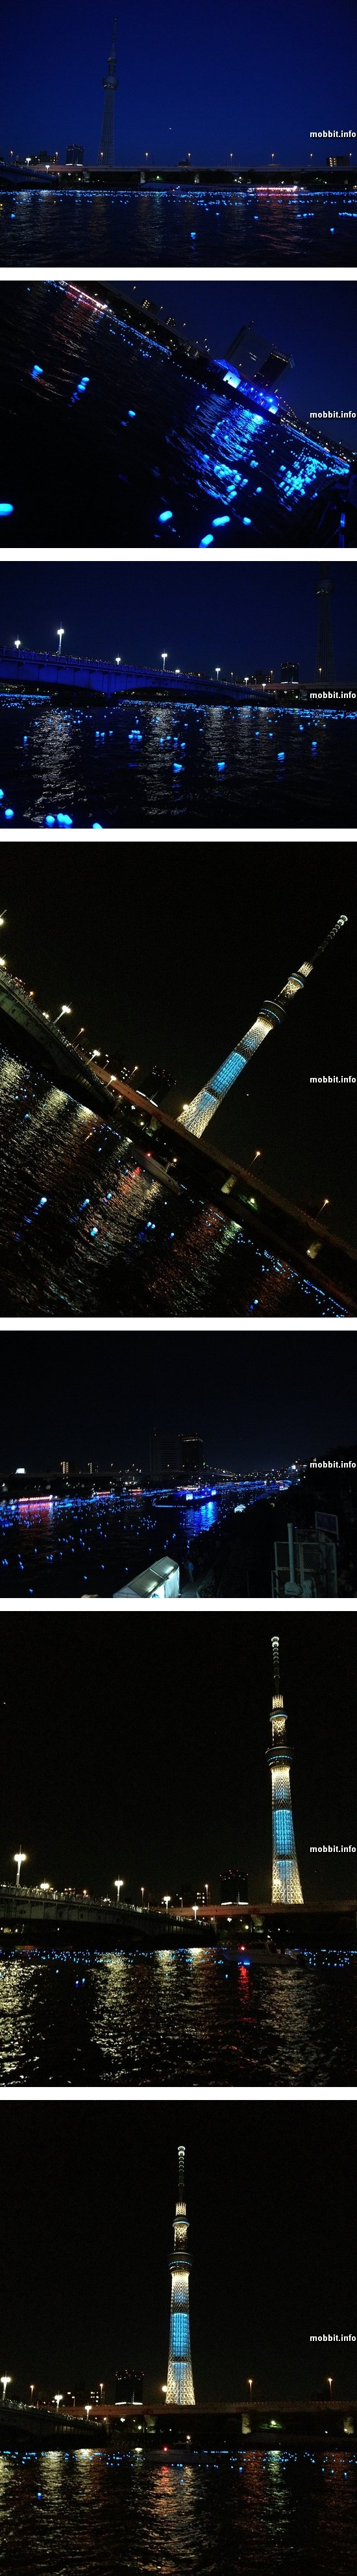 Panasonic запустила 100 000 «светлячков» по реке в Токио